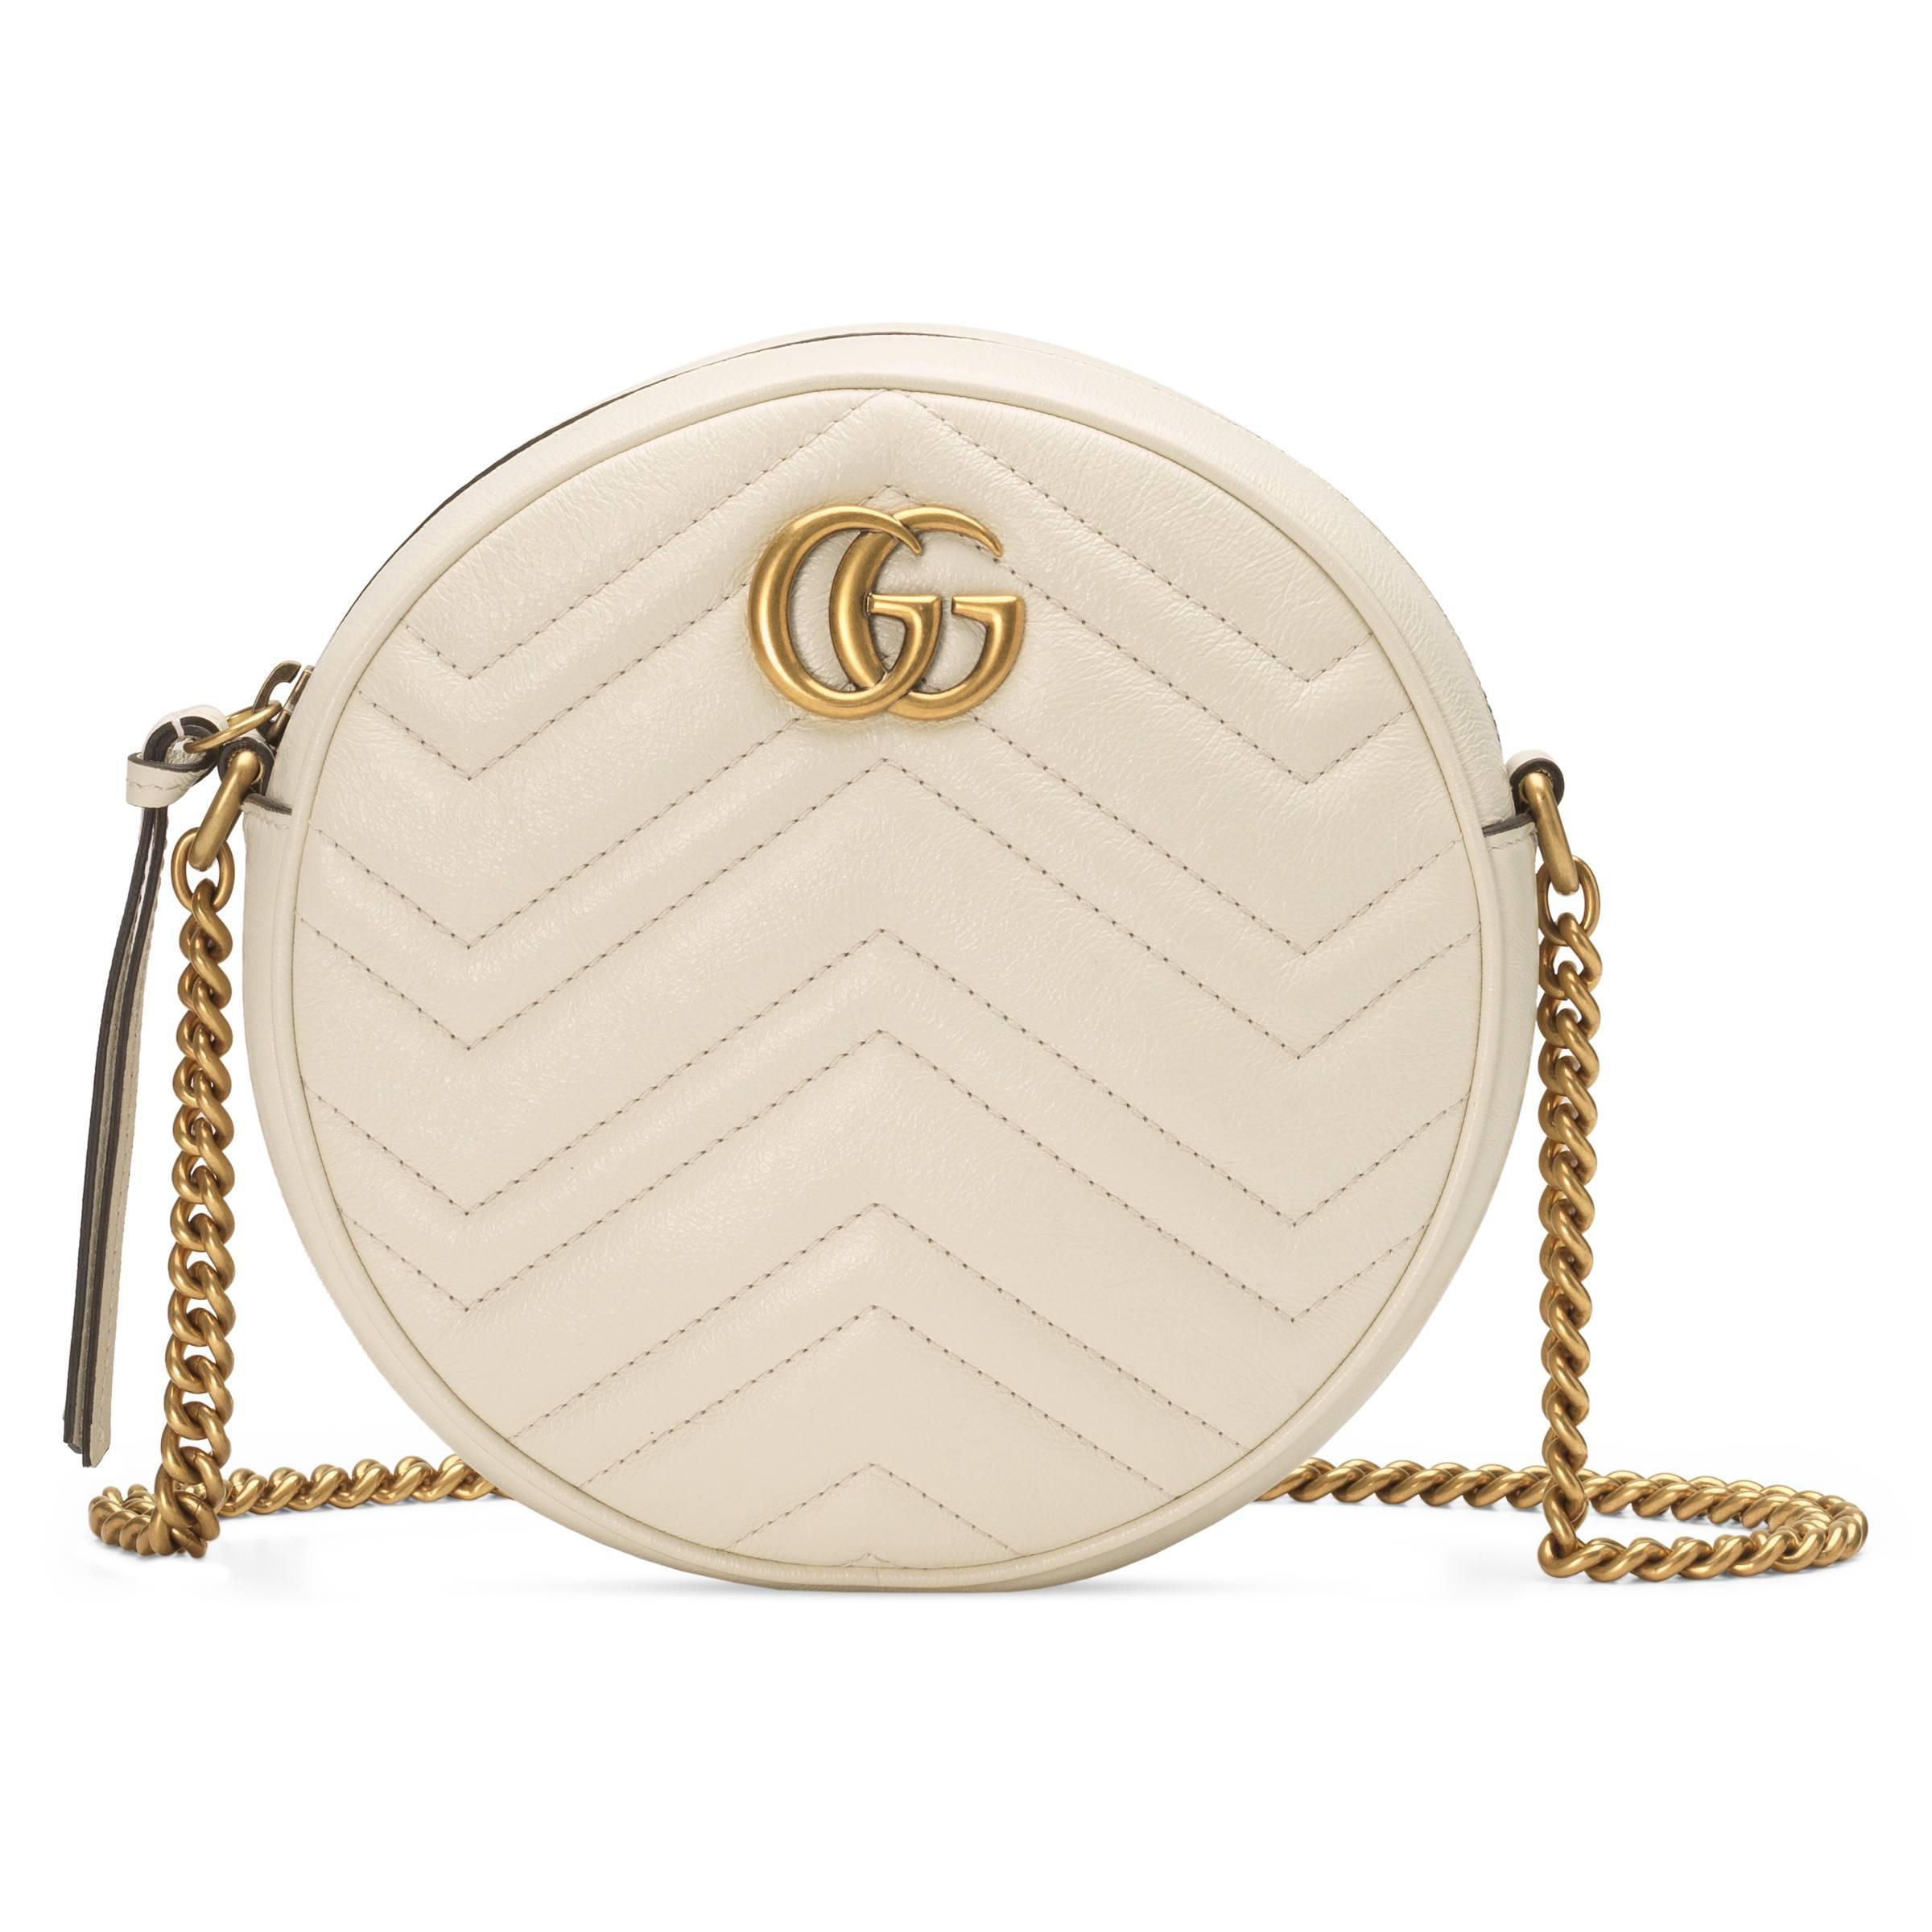 cd2116bf2ac0e2 ... GG Marmont Mini Round Shoulder Bag - Lyst. View fullscreen